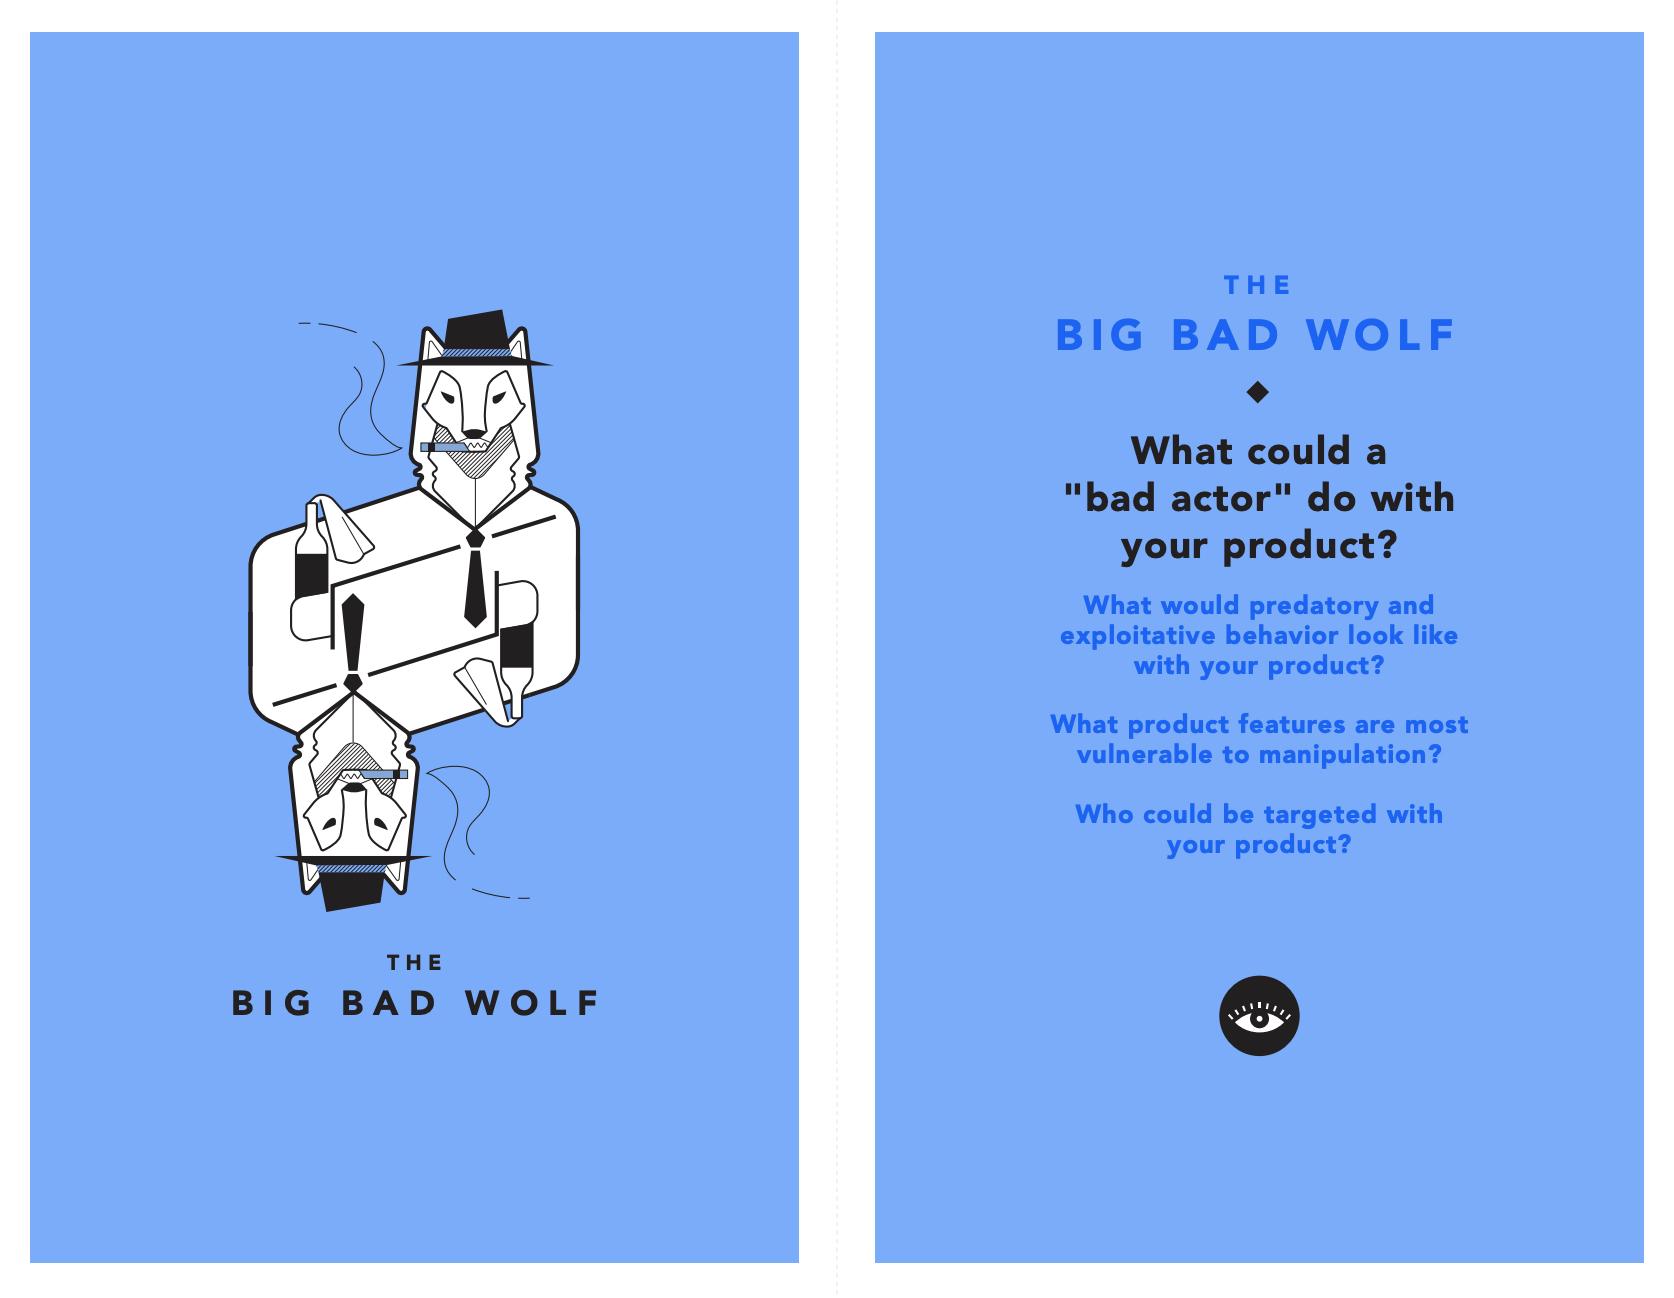 tarot cards of tech - The big bad wolf